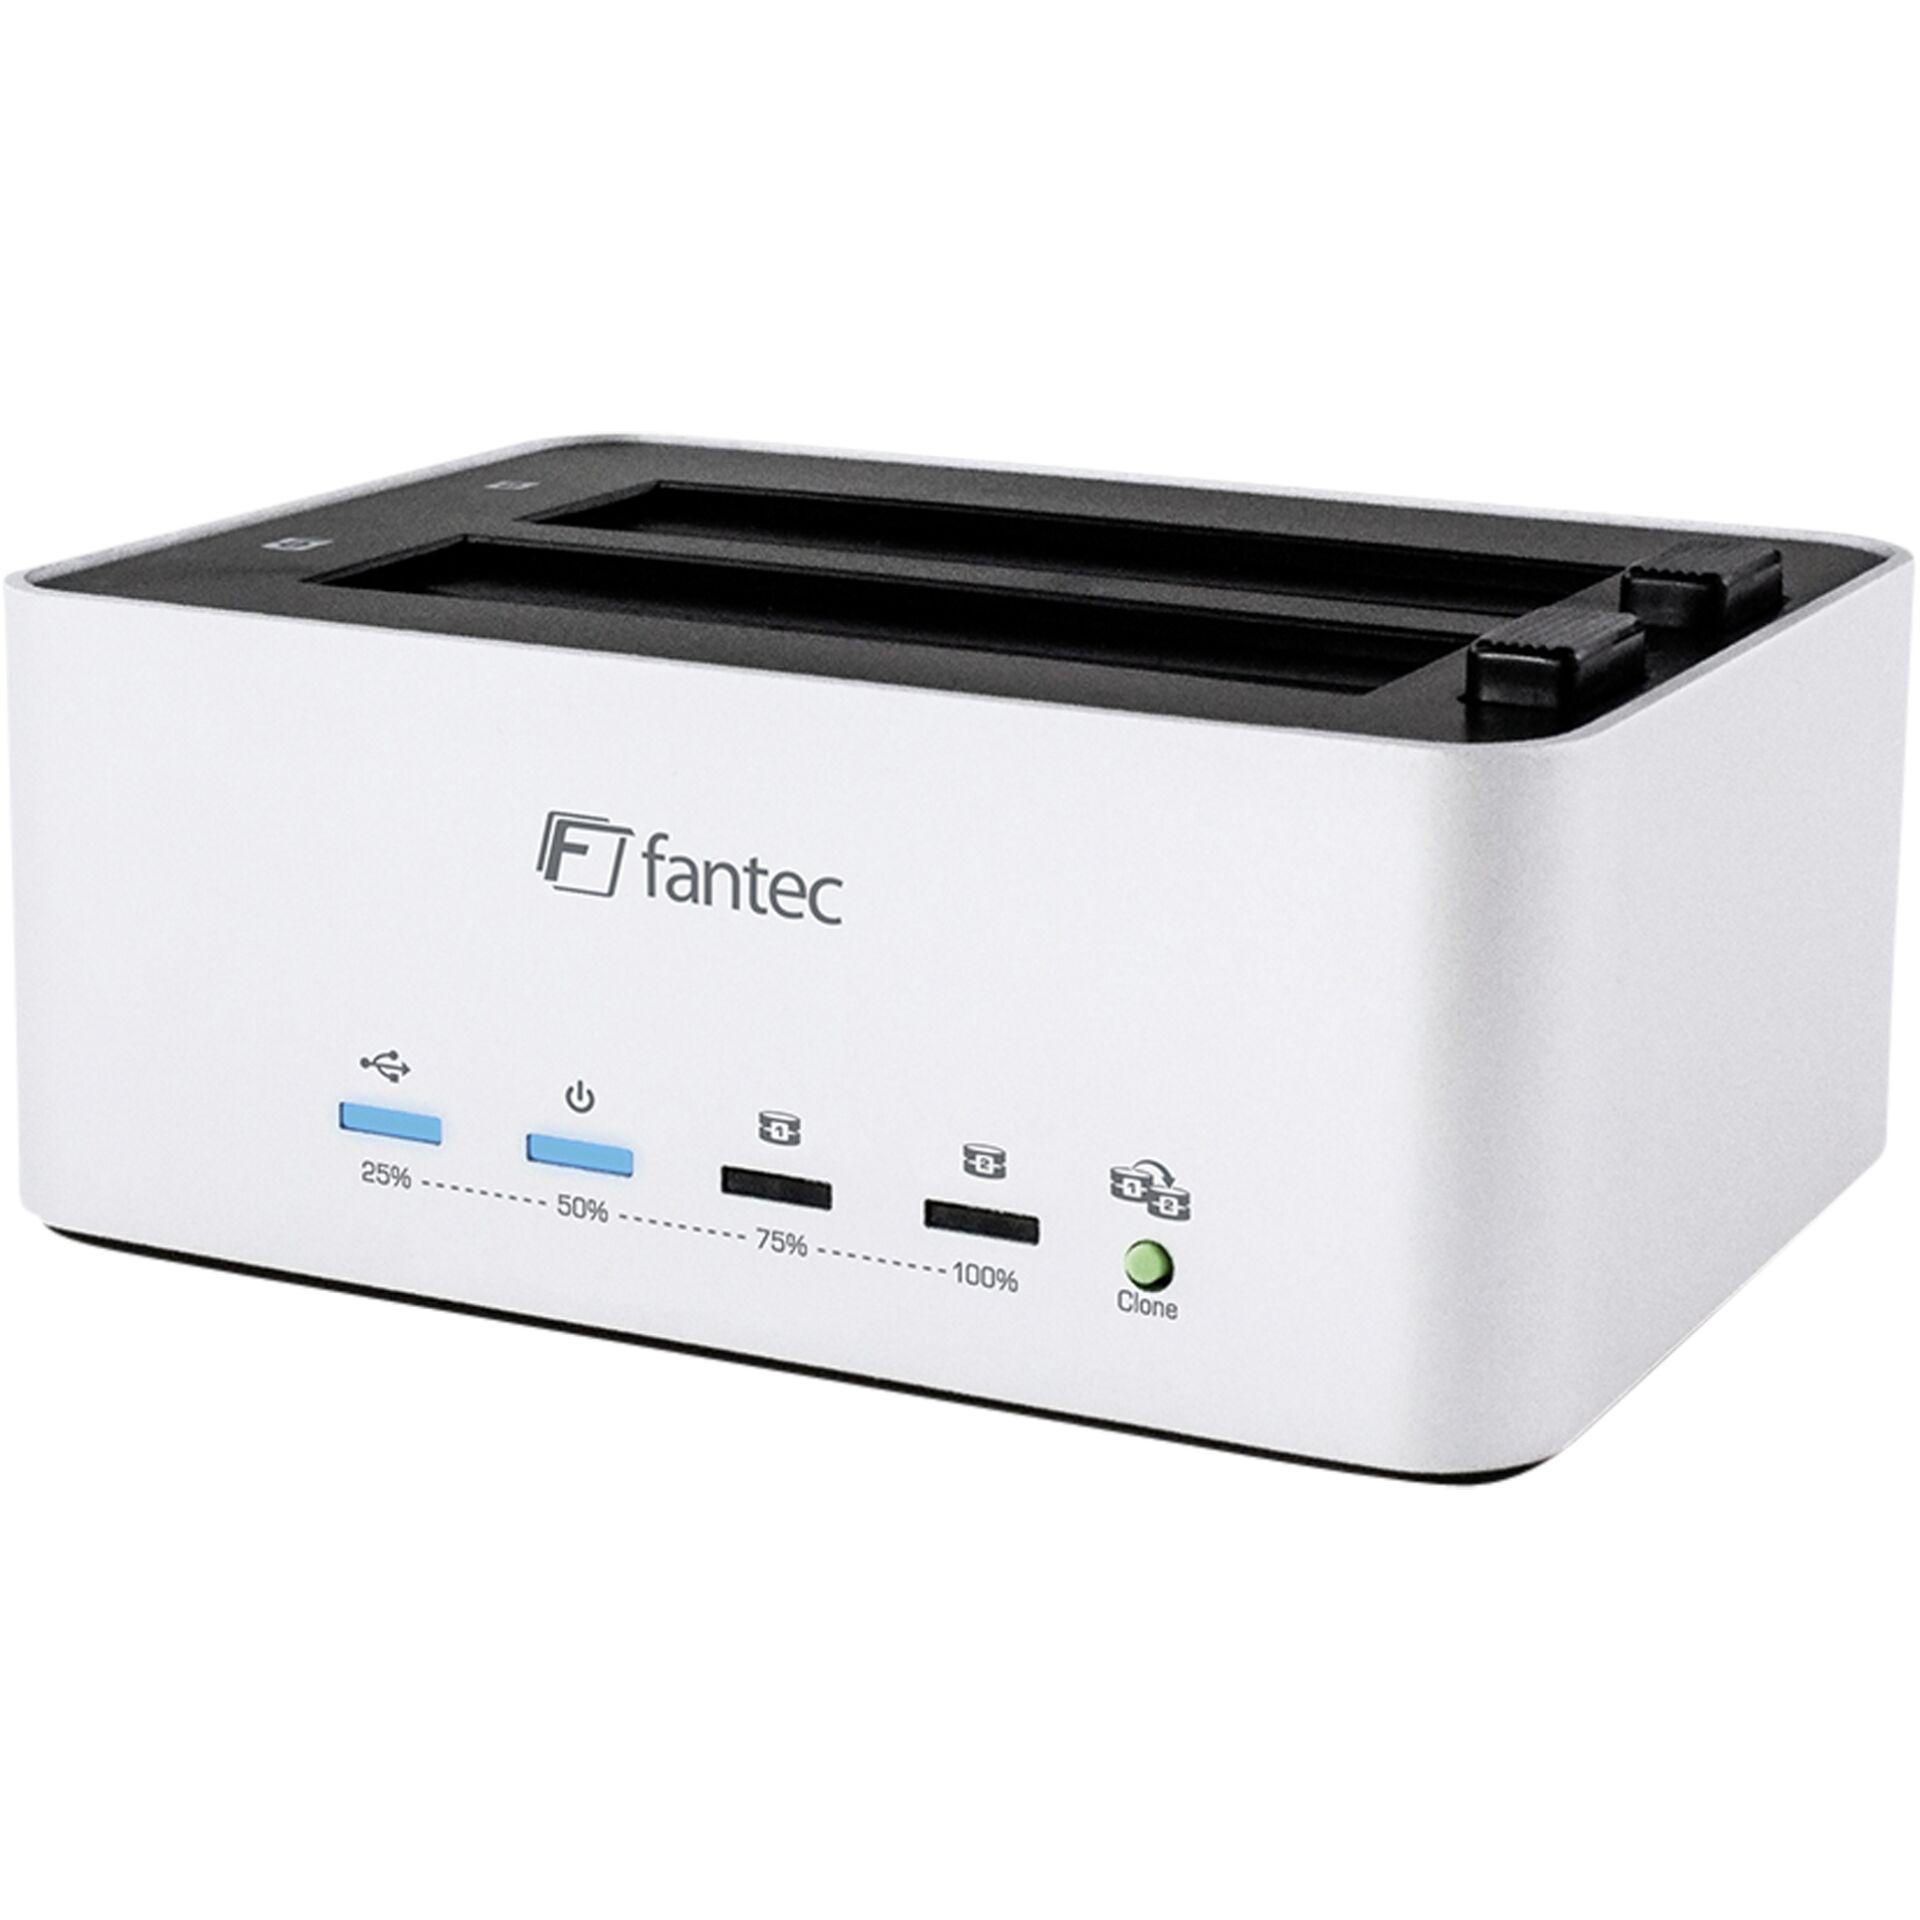 "FANTEC AluDOCK2X USB3.0 DOCKING \""Aluminium, Kopierfunktion, 2,5\"